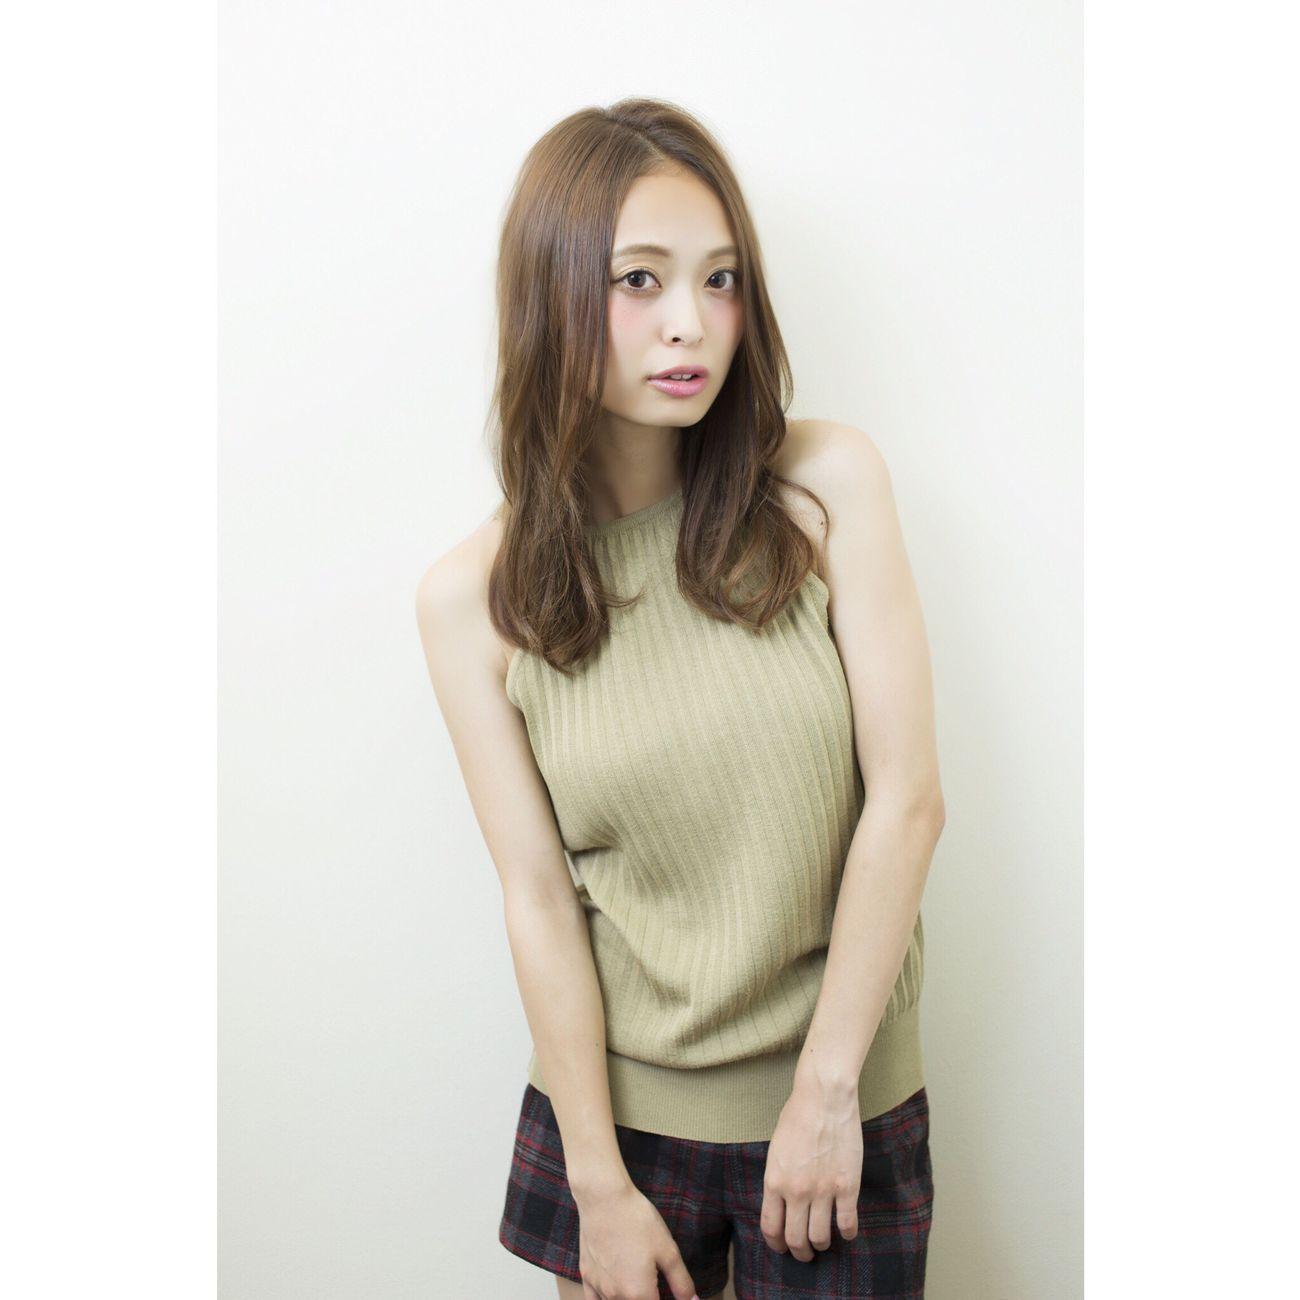 Hair Beauty Beauty Of Nature Beauty Girl Japan Japanese Girl Kokubutoshinobu Hairstyle 箕面 サロンモデル 美容室